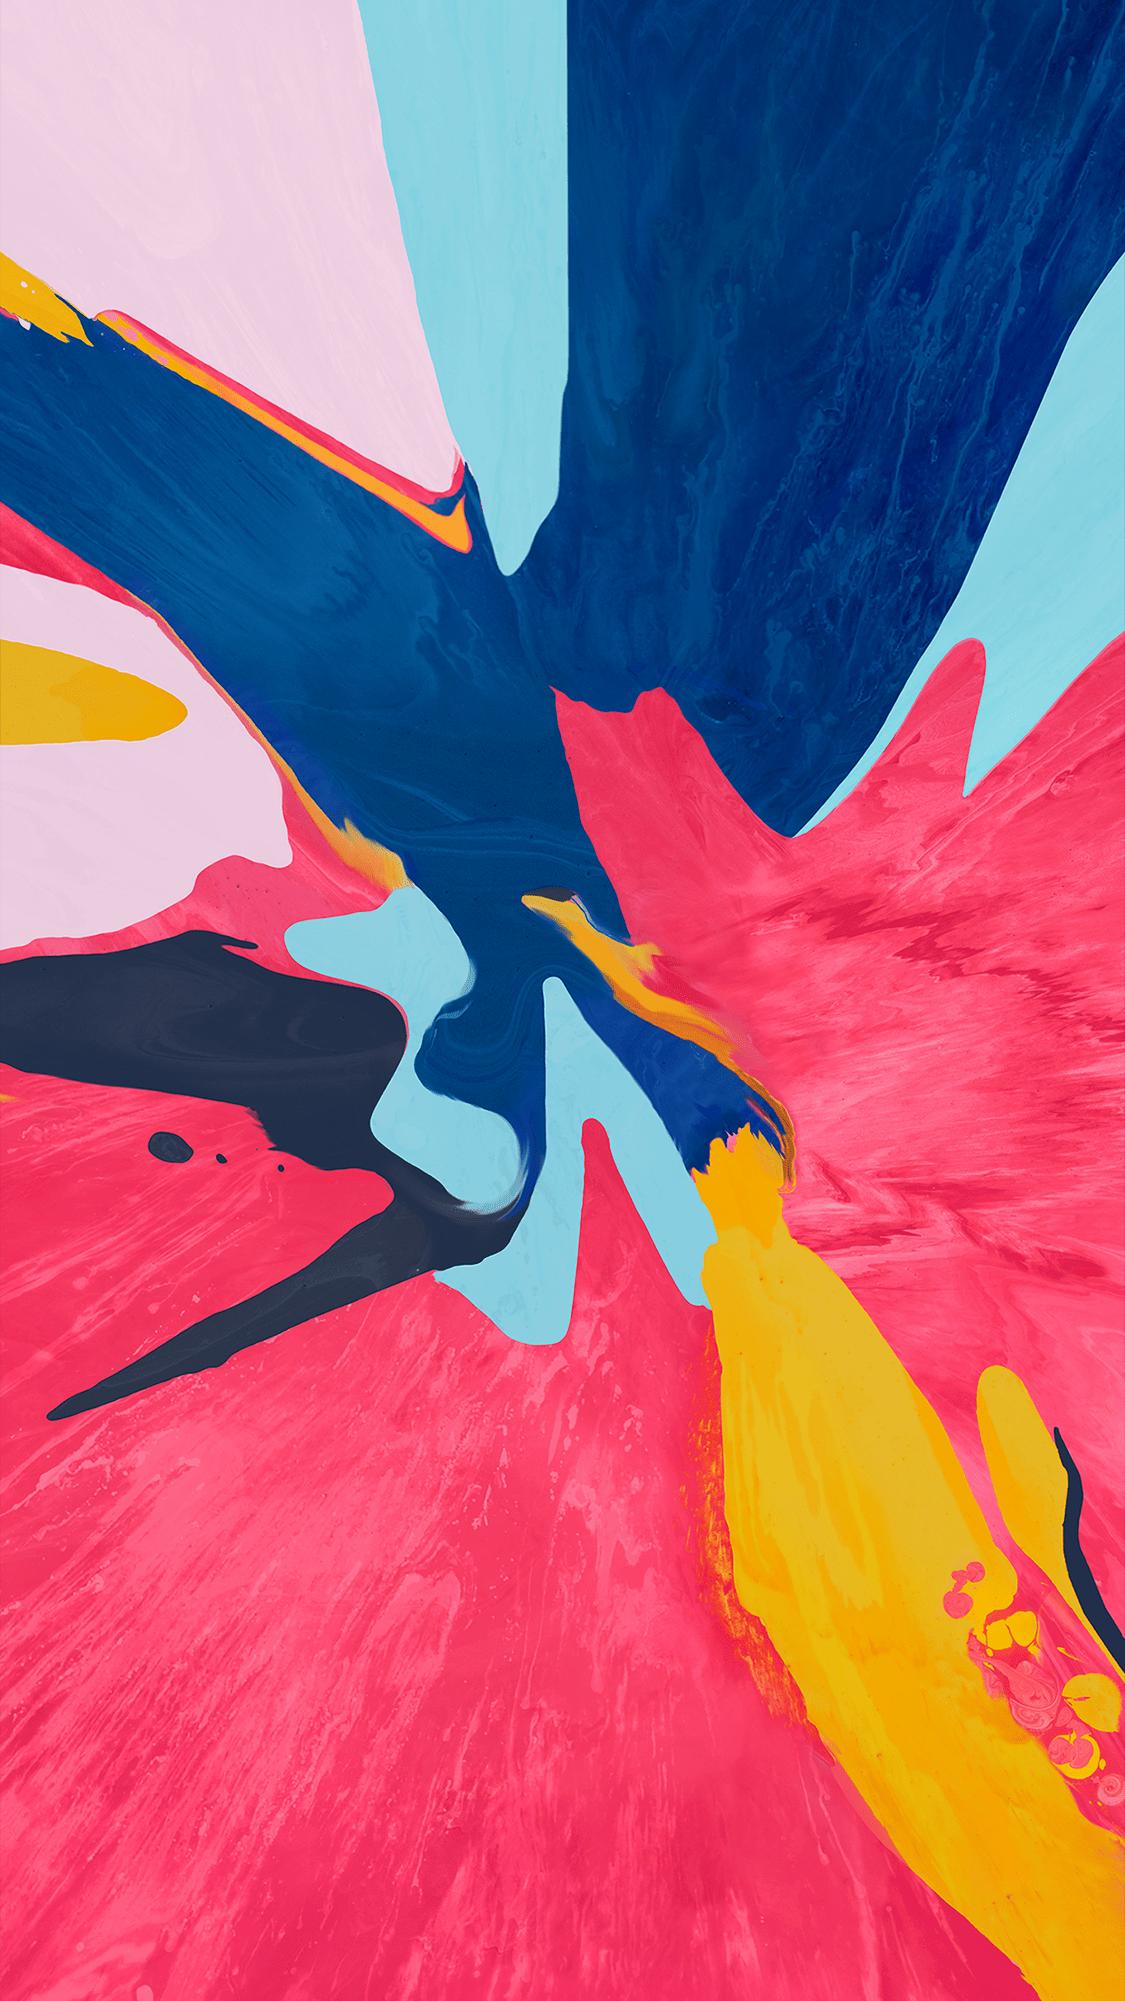 Abstract Splash Colorfull Wallpaper Iphone Fondos De Pantalla Papel Tapiz Abstracto